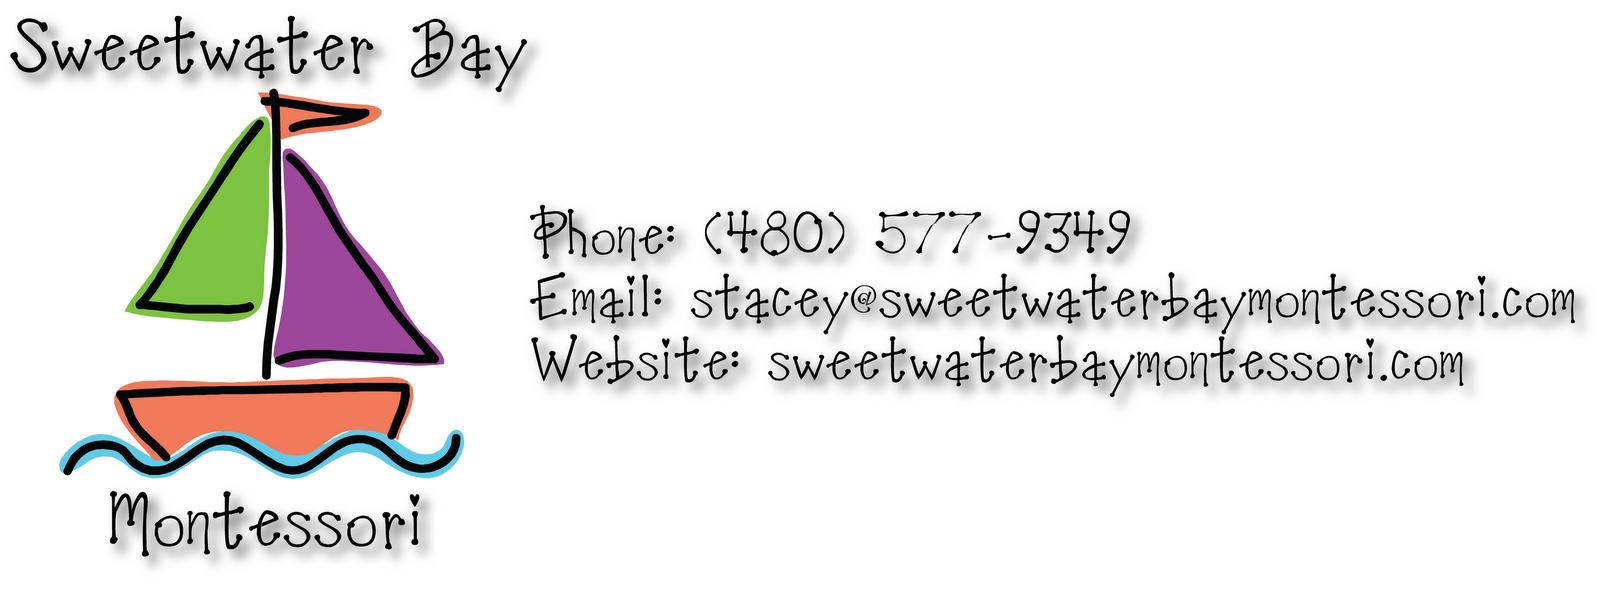 Sweetwater Bay Montessori Preschool